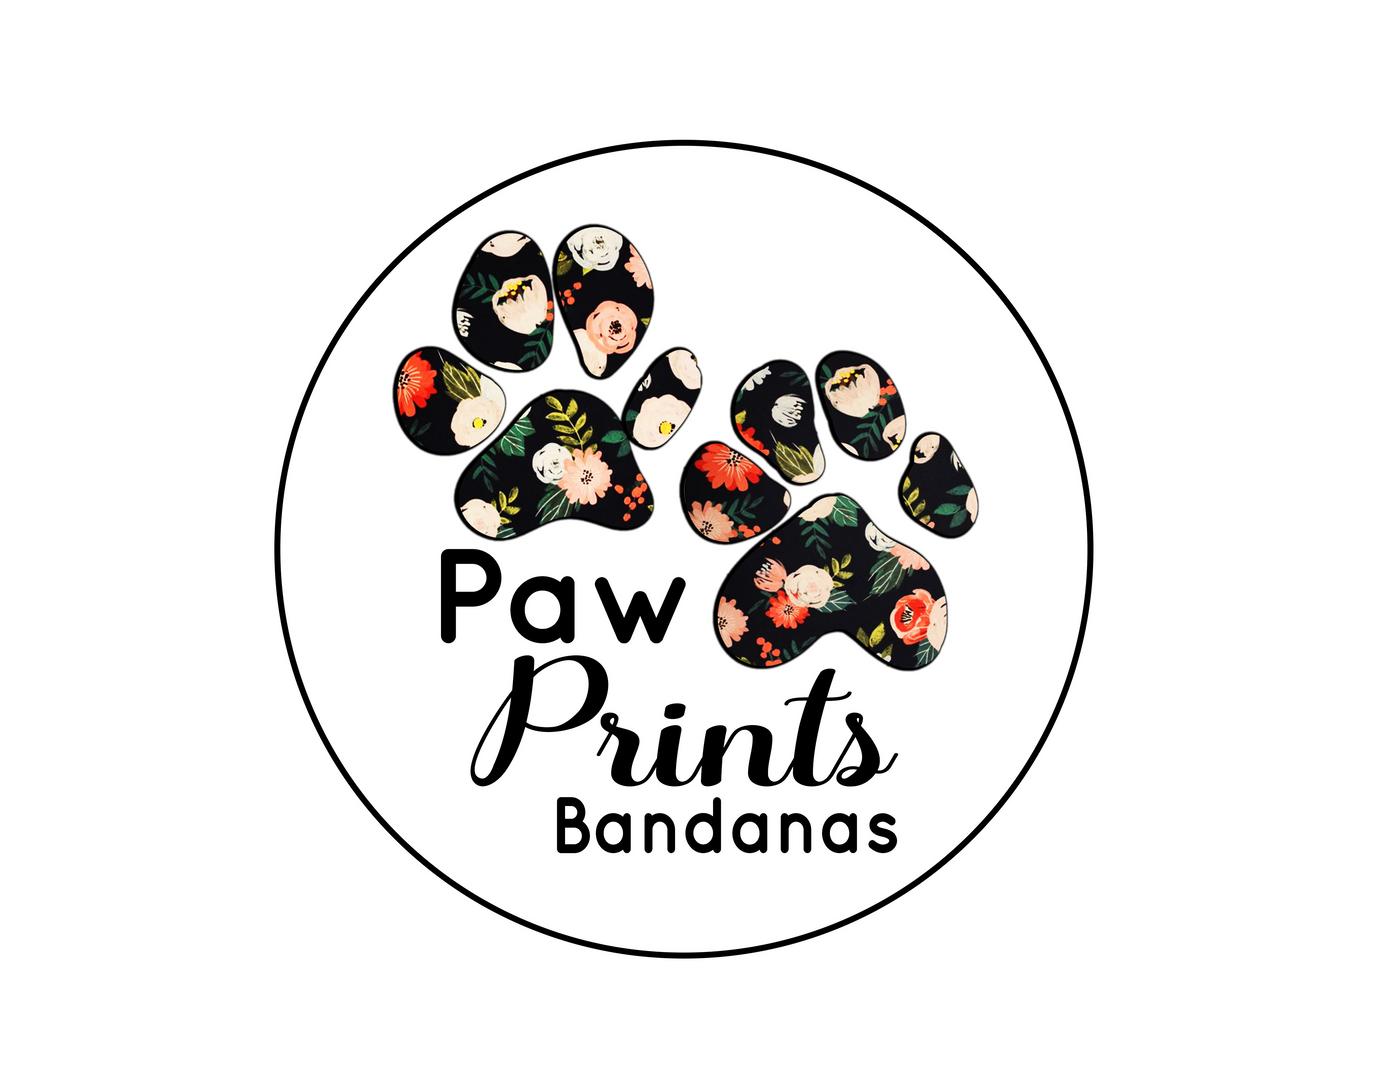 PawPrints Bandana